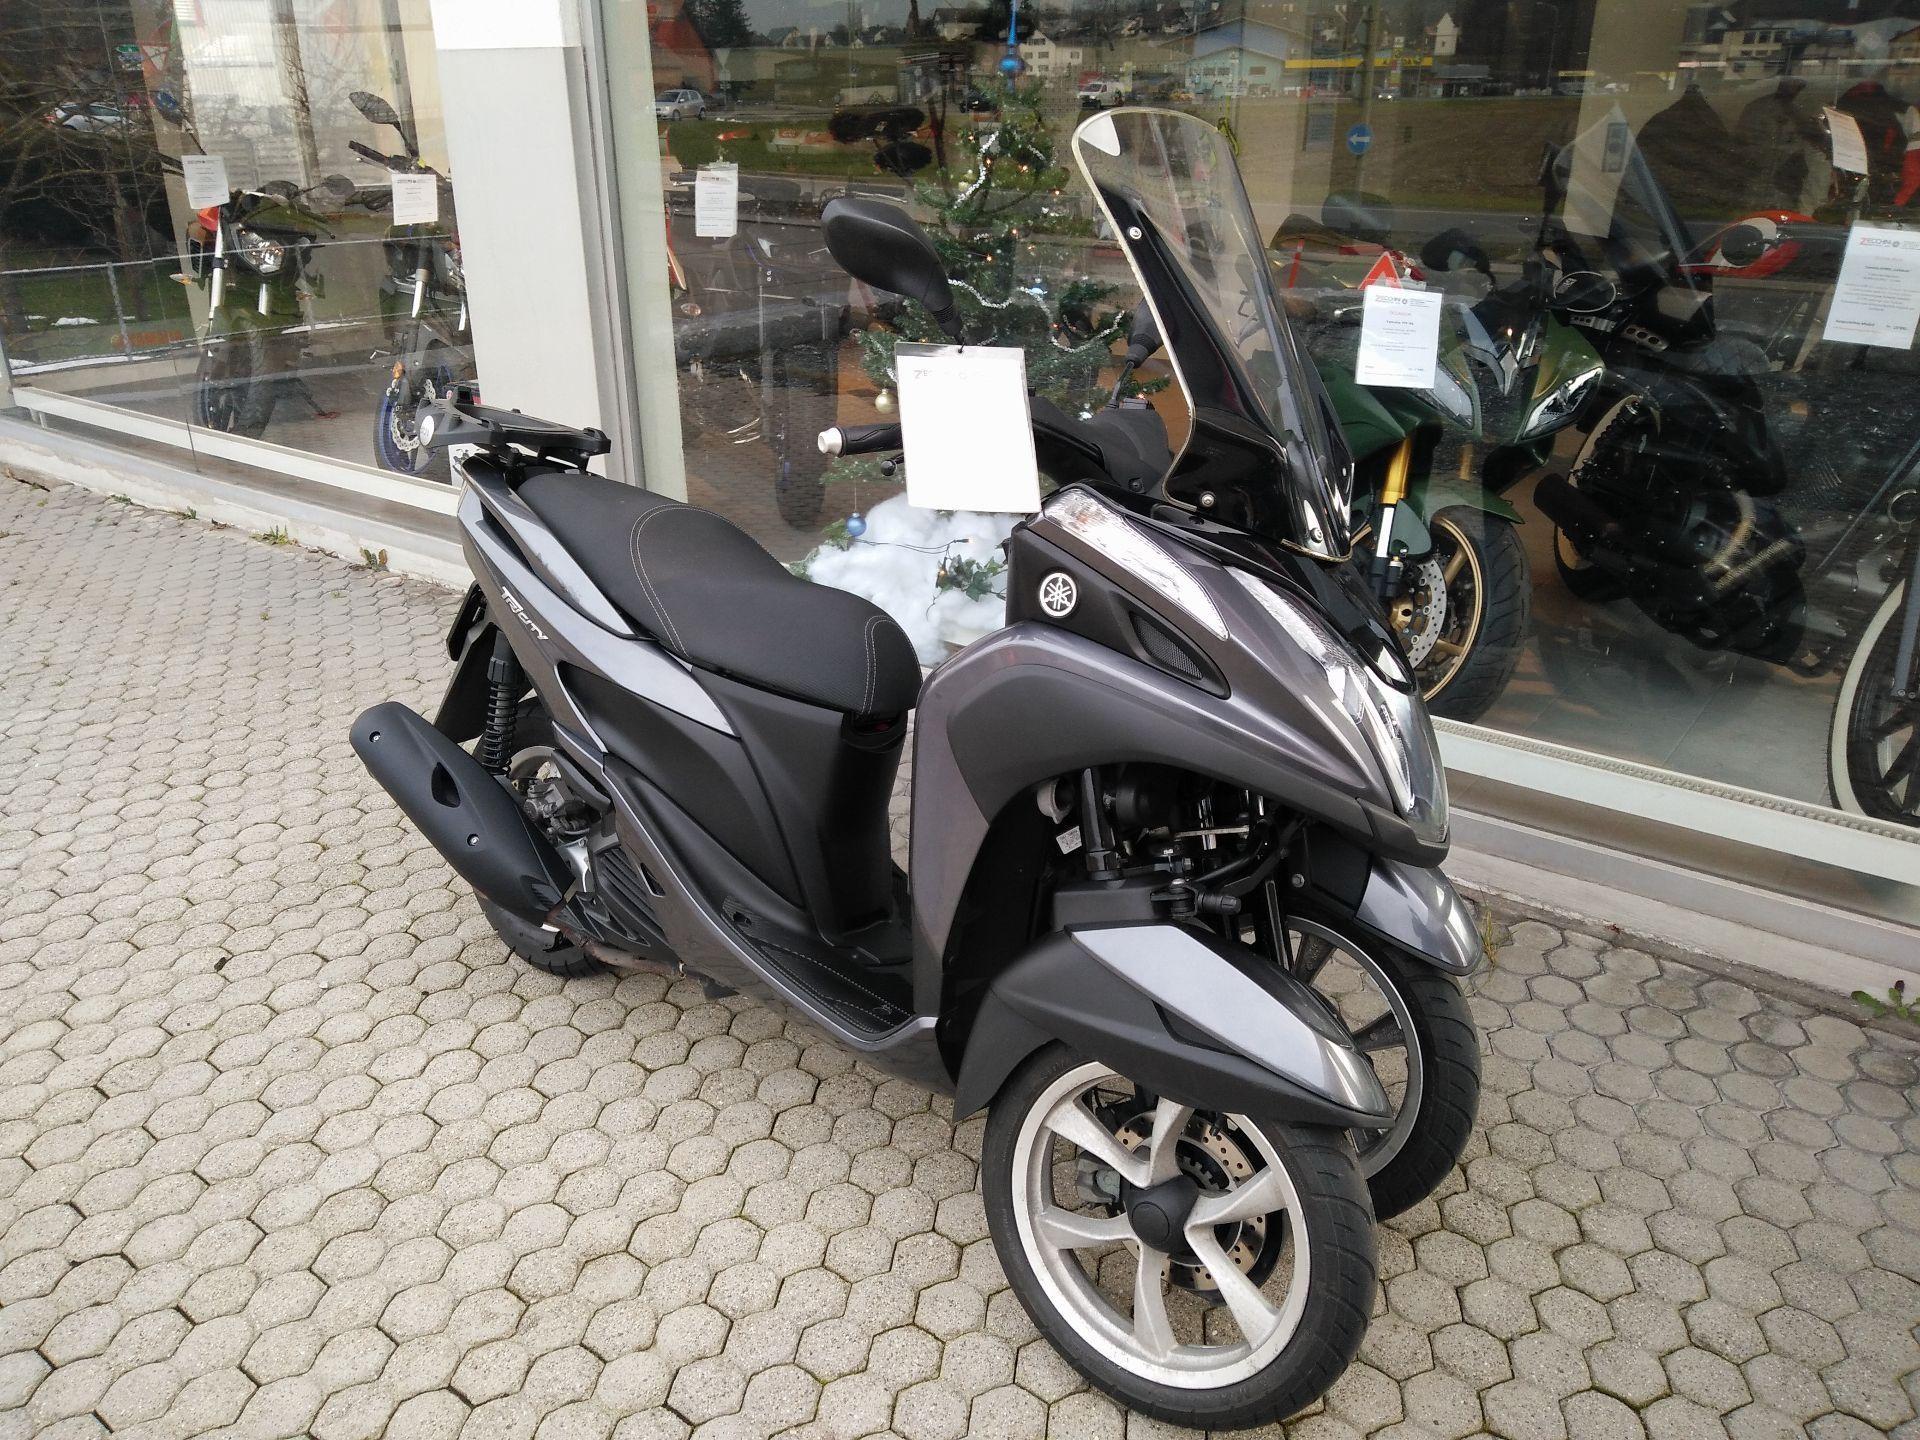 moto occasioni acquistare yamaha tricity 125 zecchini motos ag neftenbach. Black Bedroom Furniture Sets. Home Design Ideas